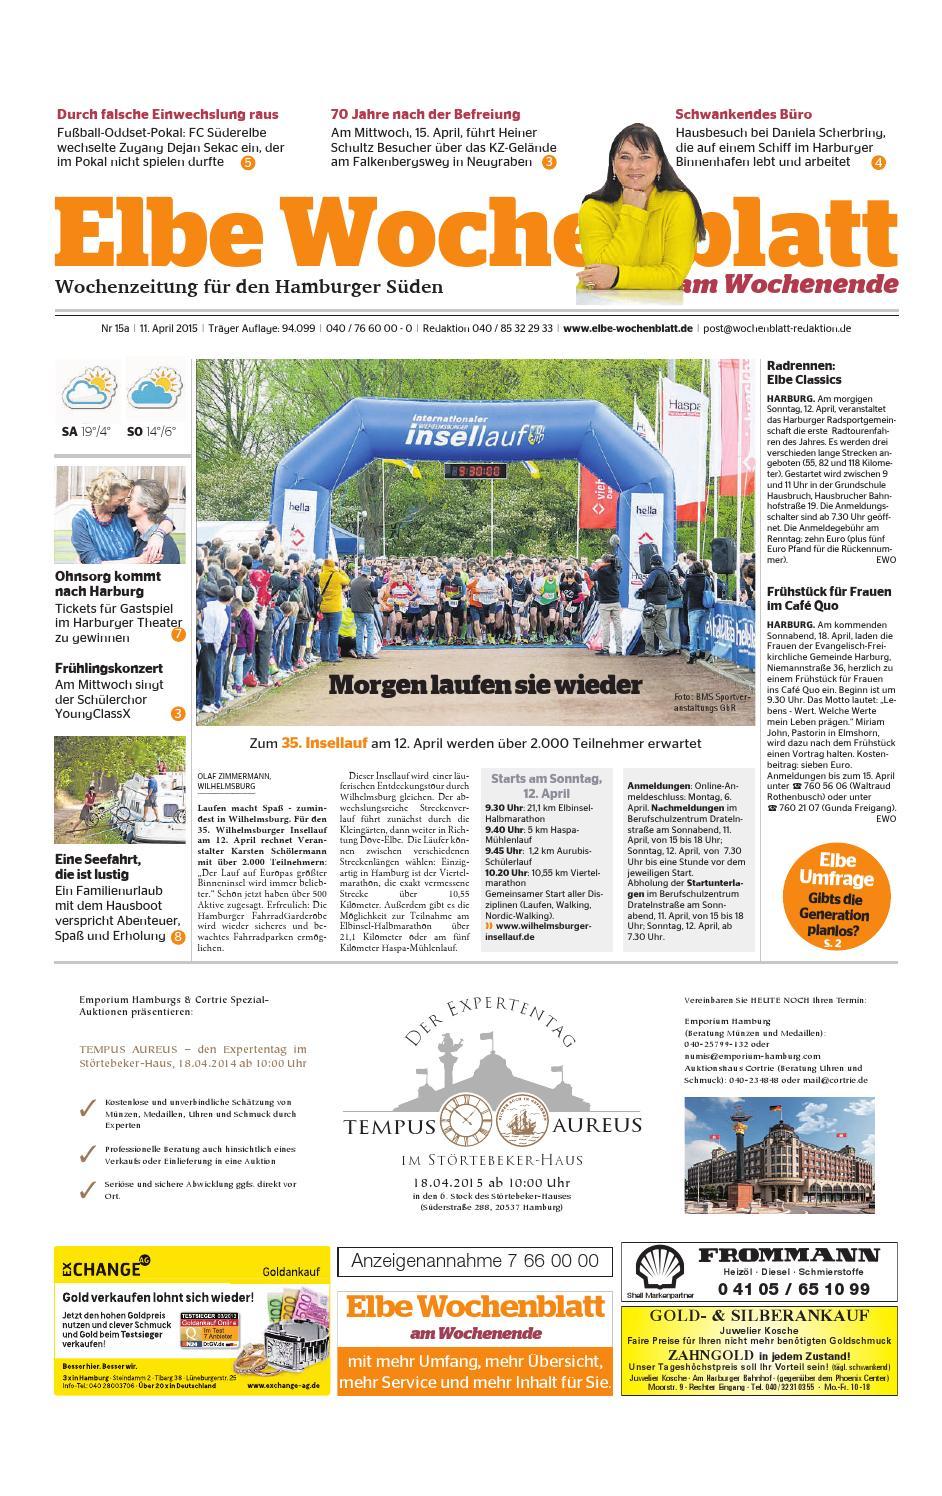 Wochenende KW15 2015 by mbH Elbe Wochenblatt Verlagsgesellschaft mbH by 3b6e67